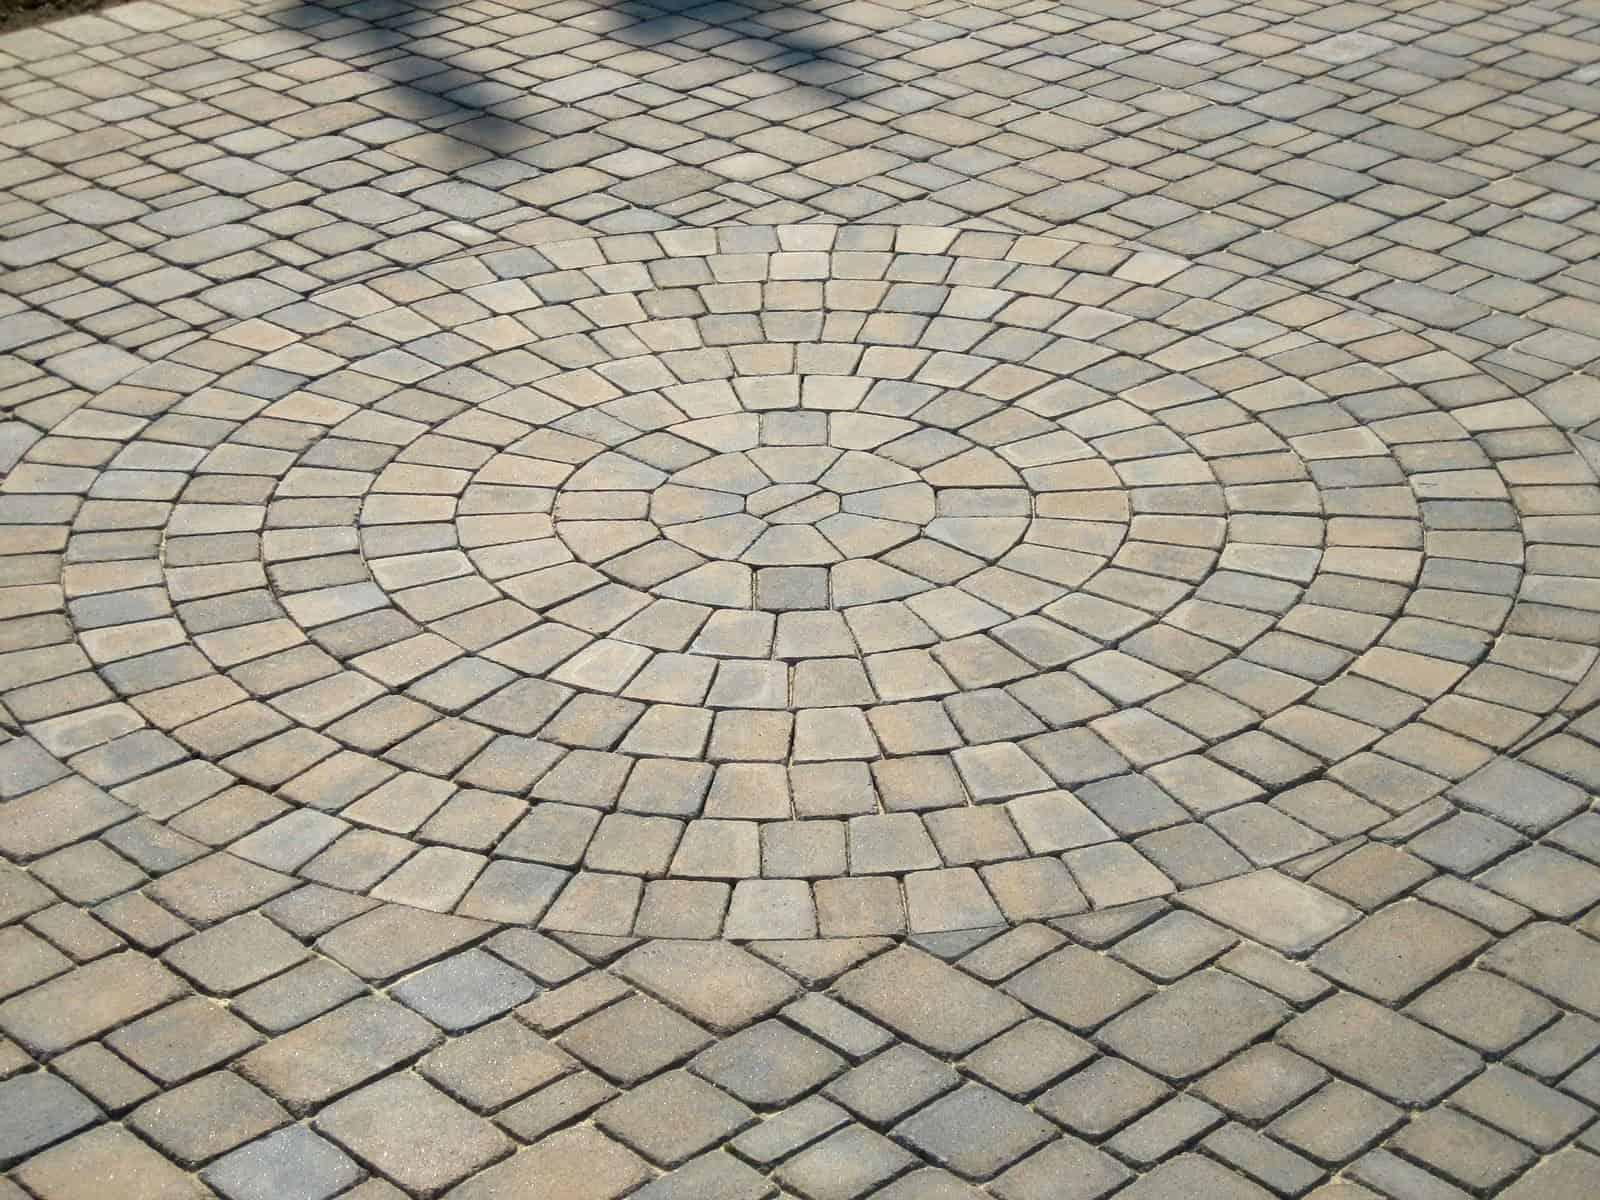 Paver Driveway - Cambridge - Tumbled Circle Design Kit – Renaissance Collection - Color - Toffee/Onyx - Jericho, Long Island